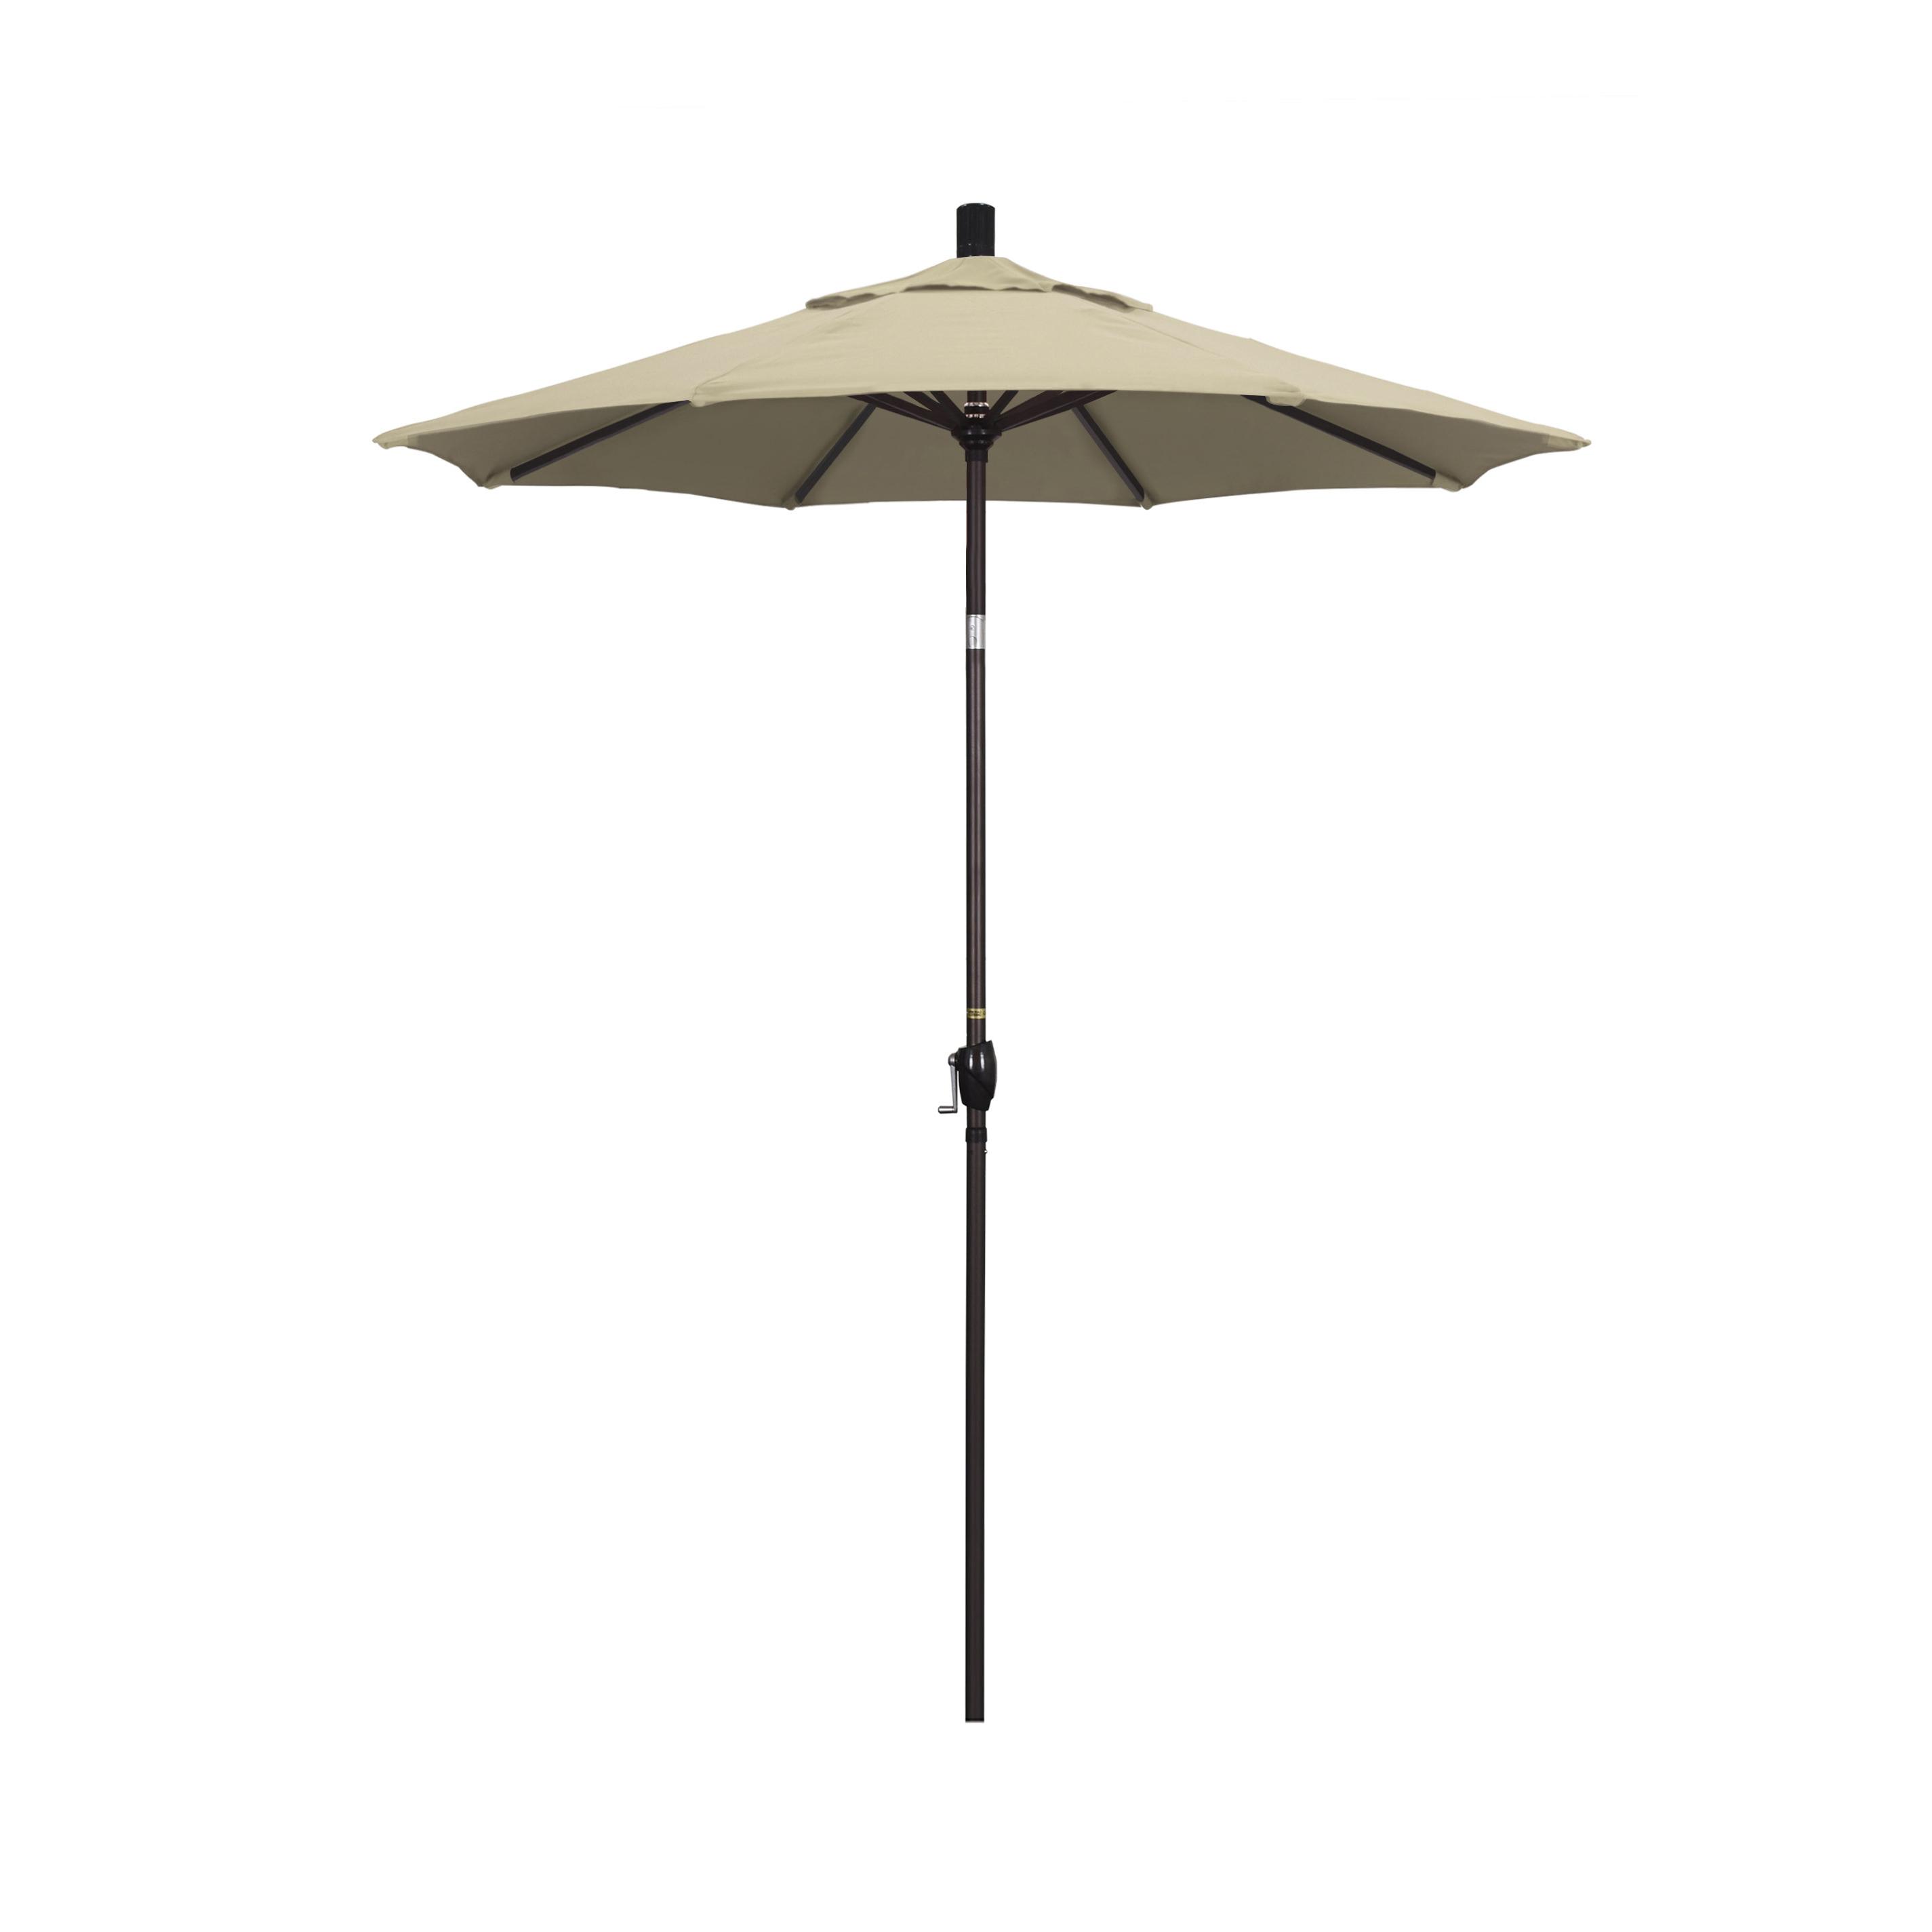 Wallach Market Sunbrella Umbrellas Intended For Most Up To Date Wallach 6' Market Sunbrella Umbrella (View 16 of 20)